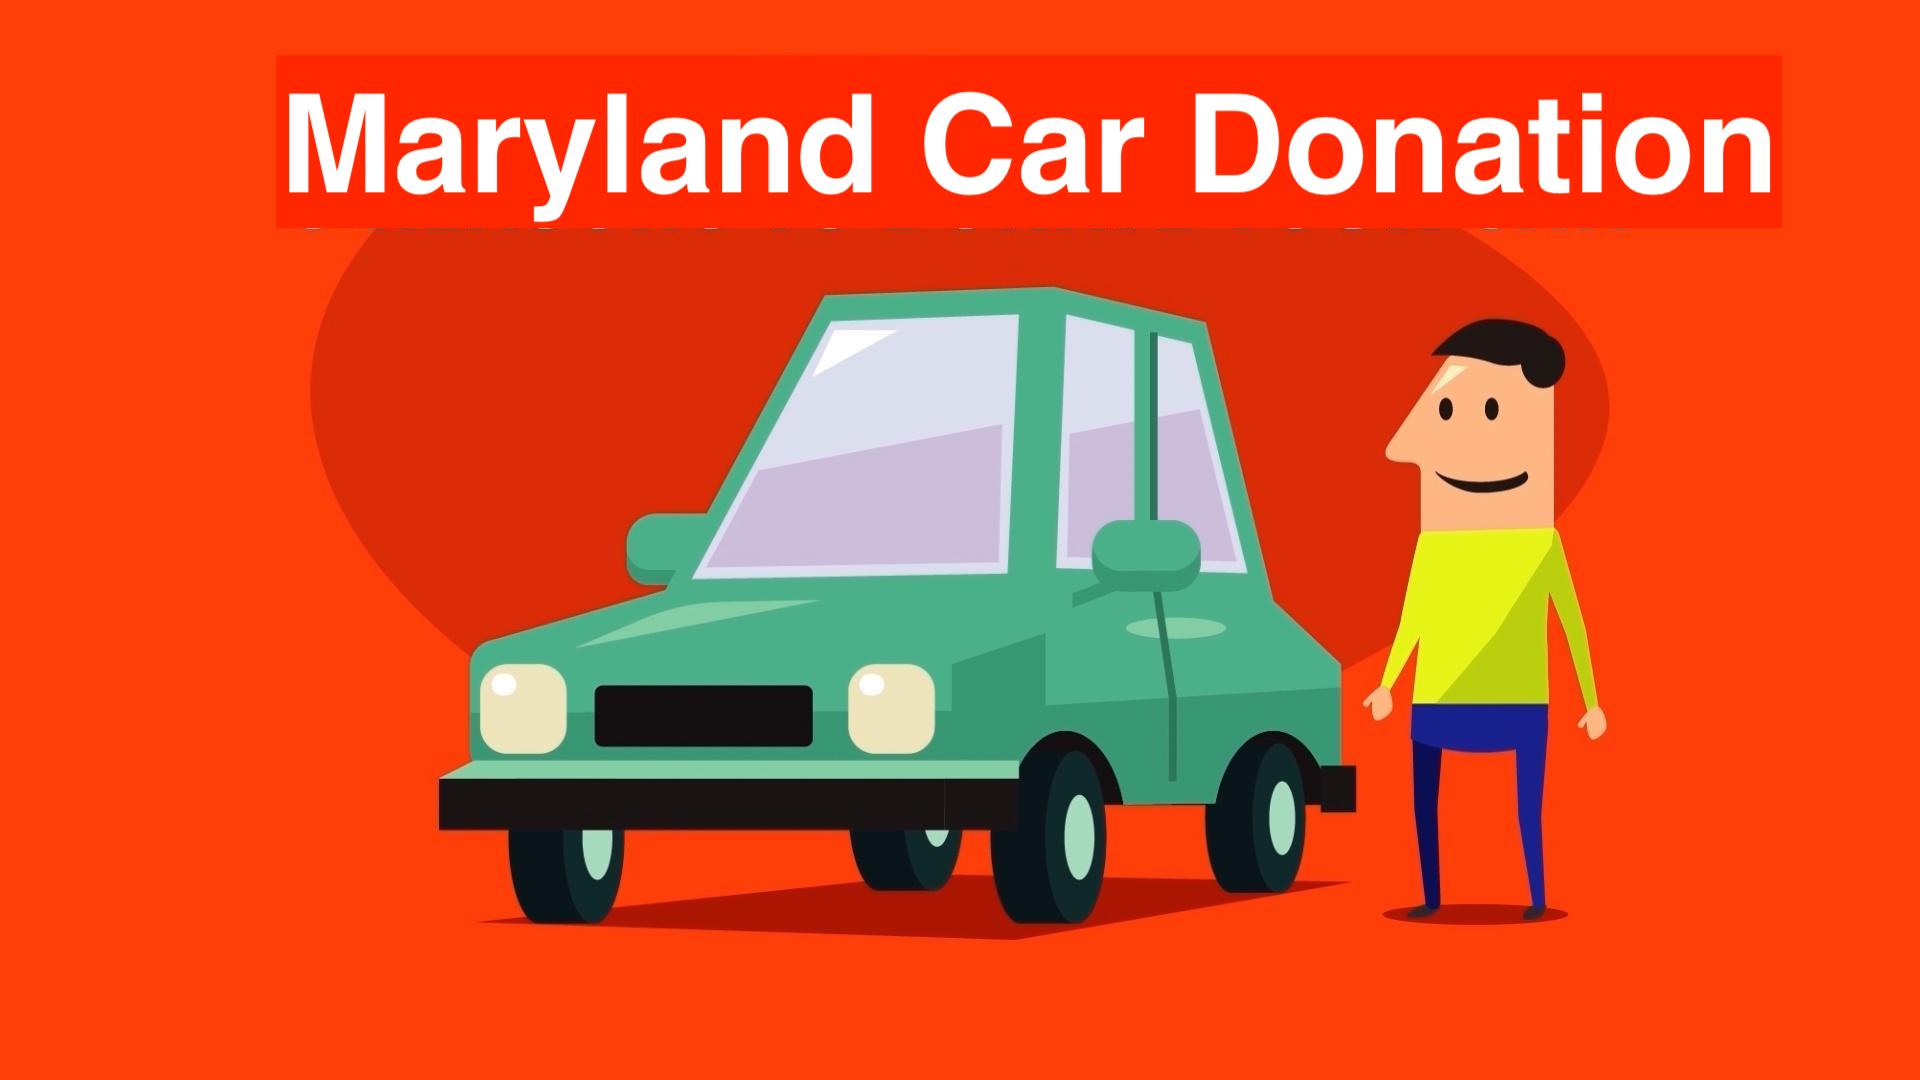 Maryland Car Donation